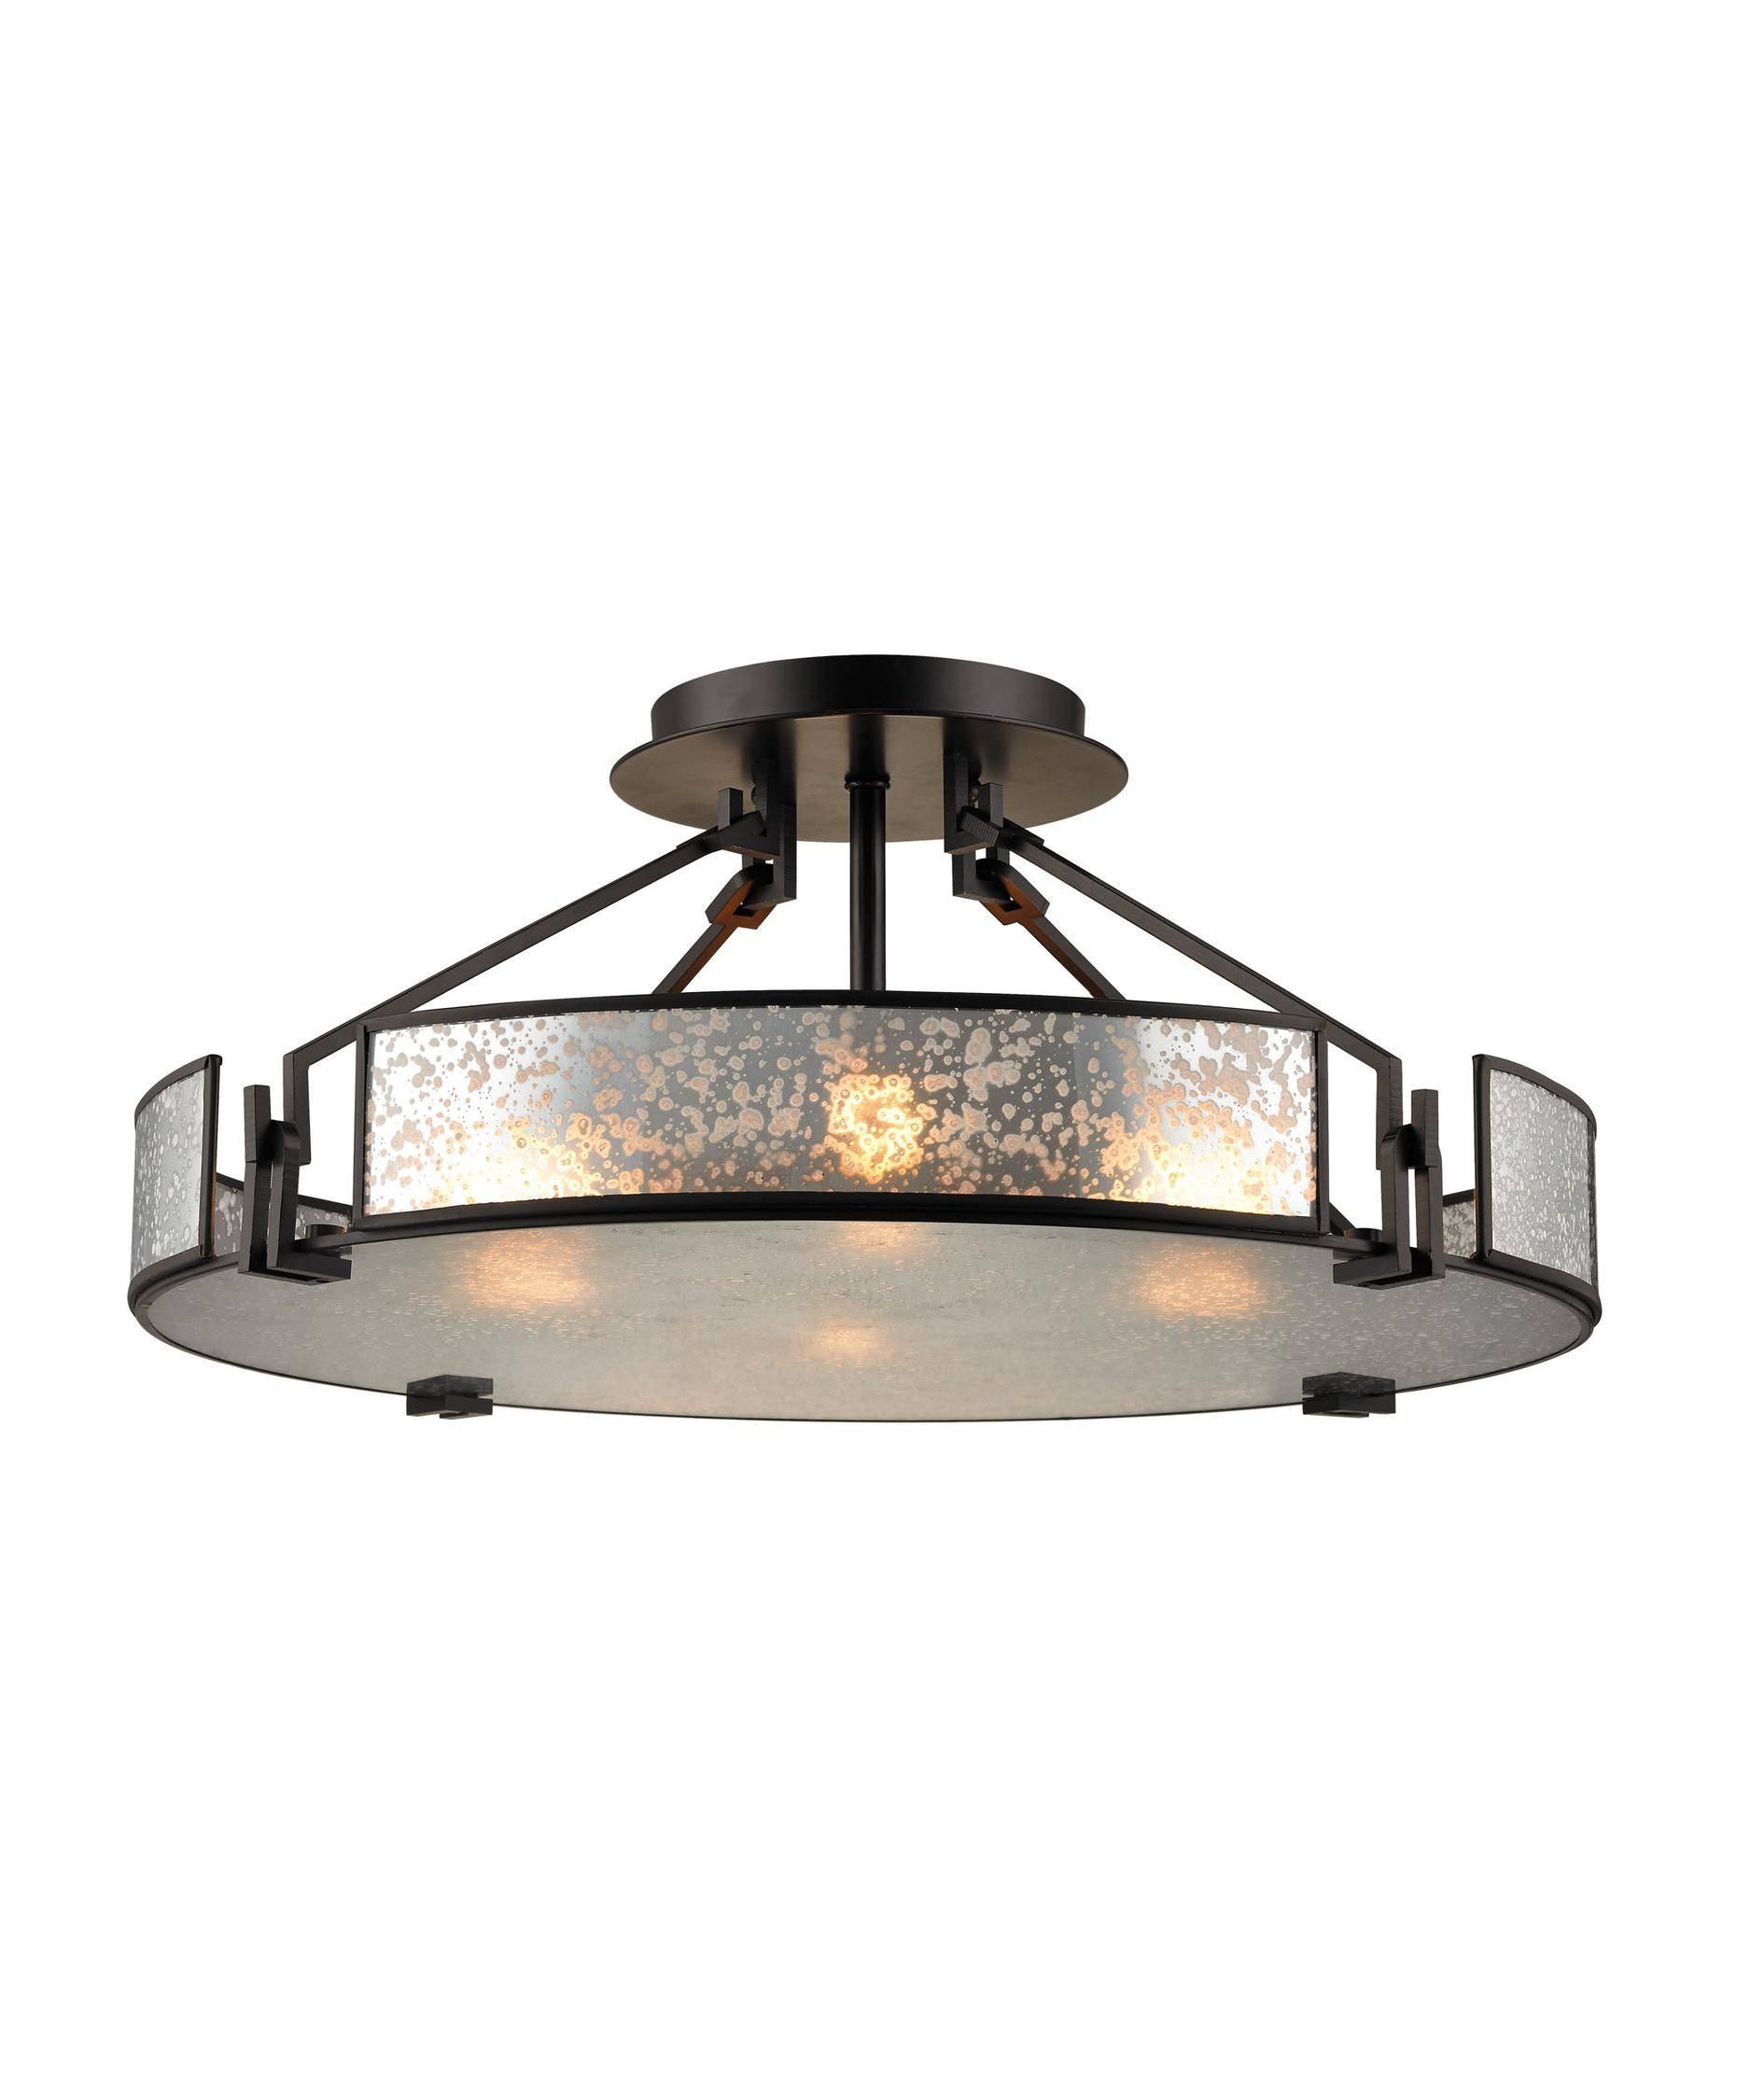 Elk Lighting 57091-4 Lindhurst 21 Inch Wide Semi Flush Mount with Mercury Glass Lighting Fixtures (Image 7 of 15)